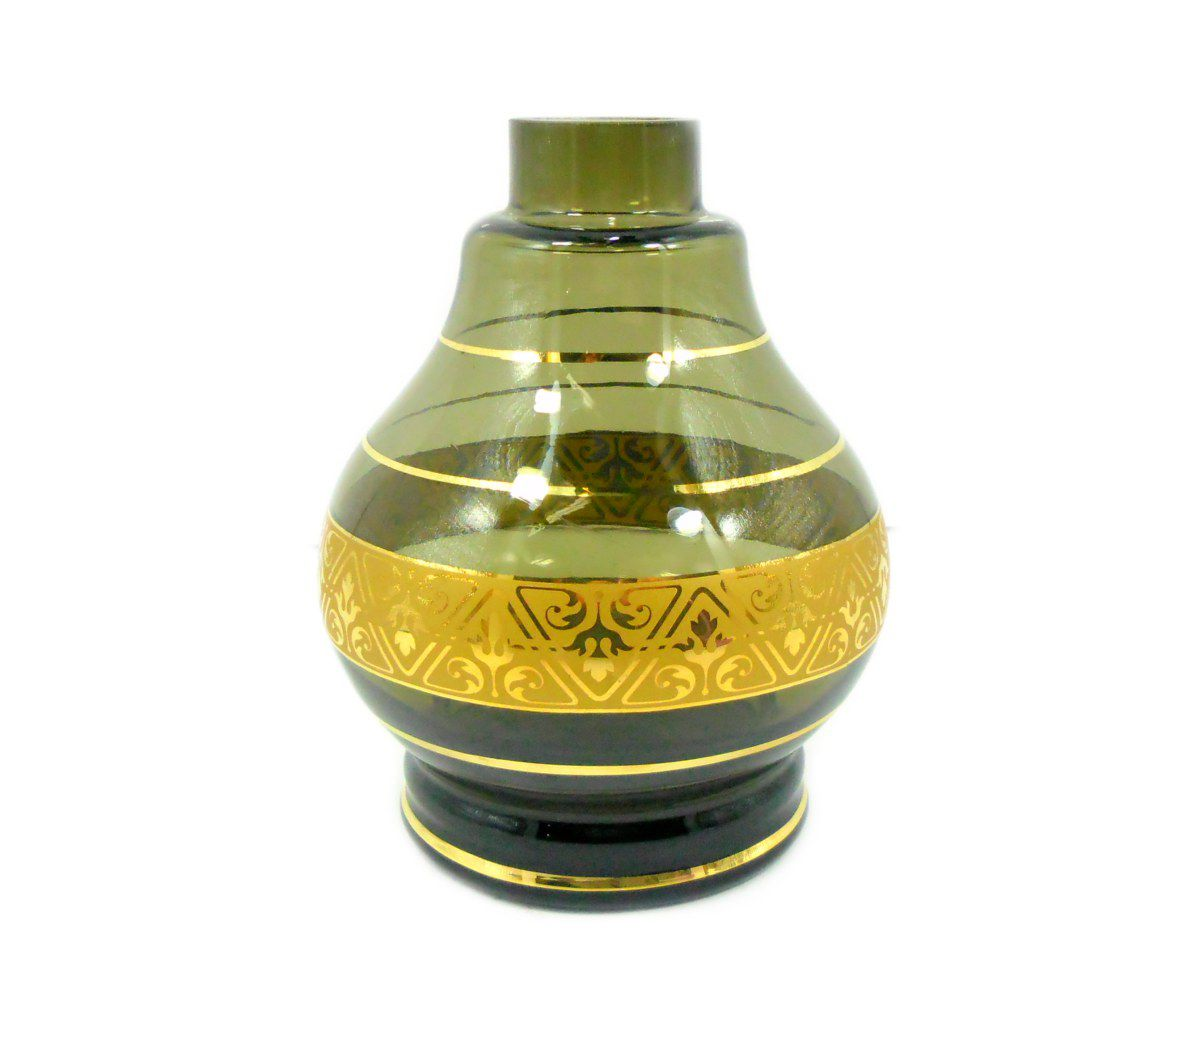 Vaso/base p/narguile GOTA / DROP MG Hookah. 15,0cm alt, 3,8cm bocal. CINZA E FAIXA DOURADA.QB0317